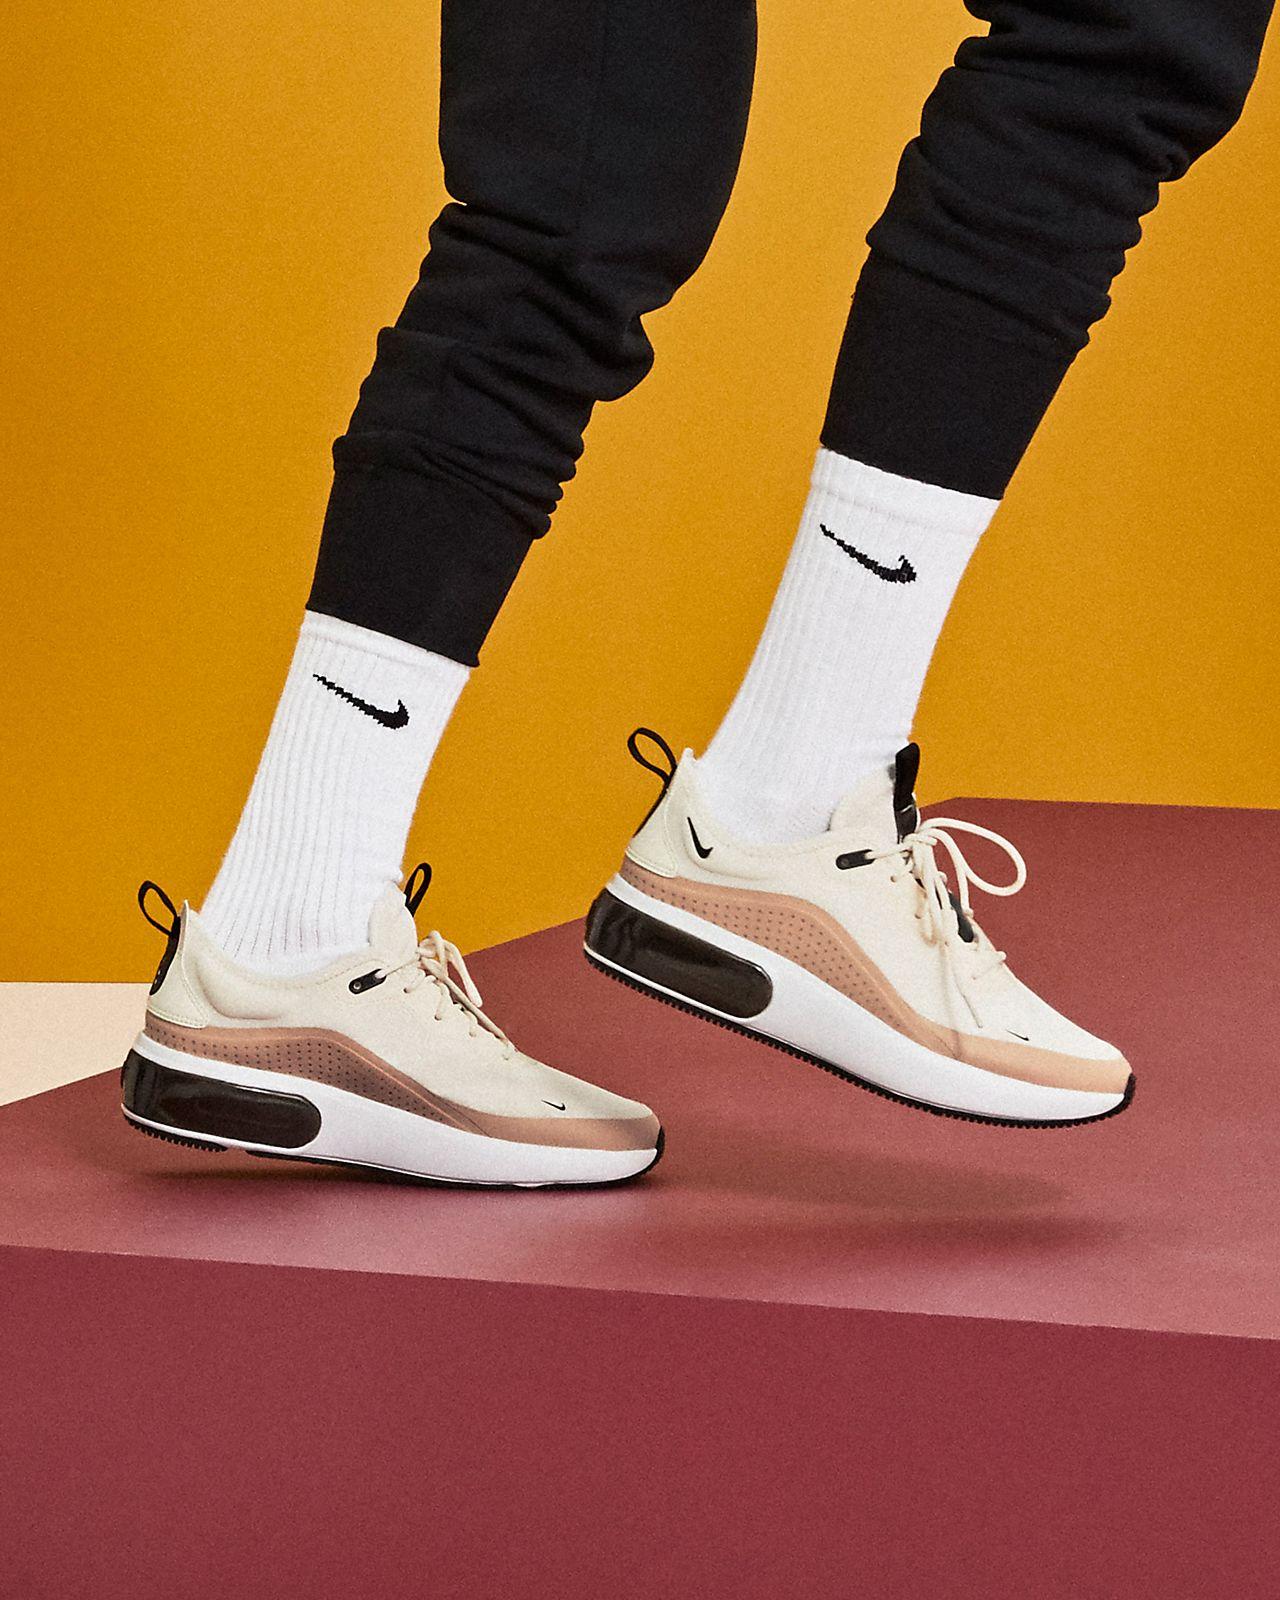 newest 1efb9 d9052 ... Nike Air Max Dia Shoe